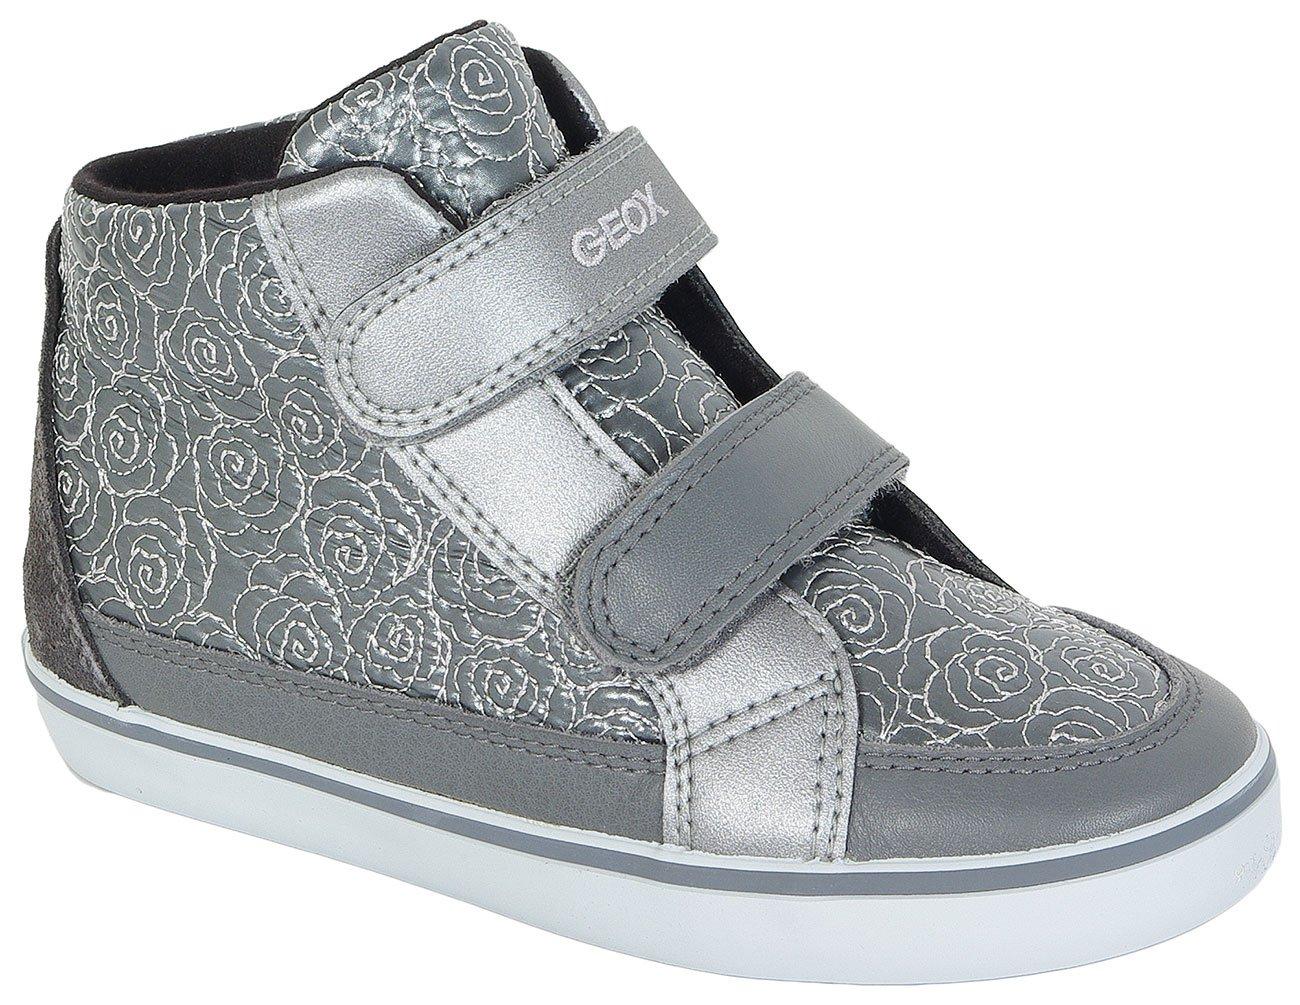 GEOX KIWI A sneakers NYLON+NAPPA DK GREY